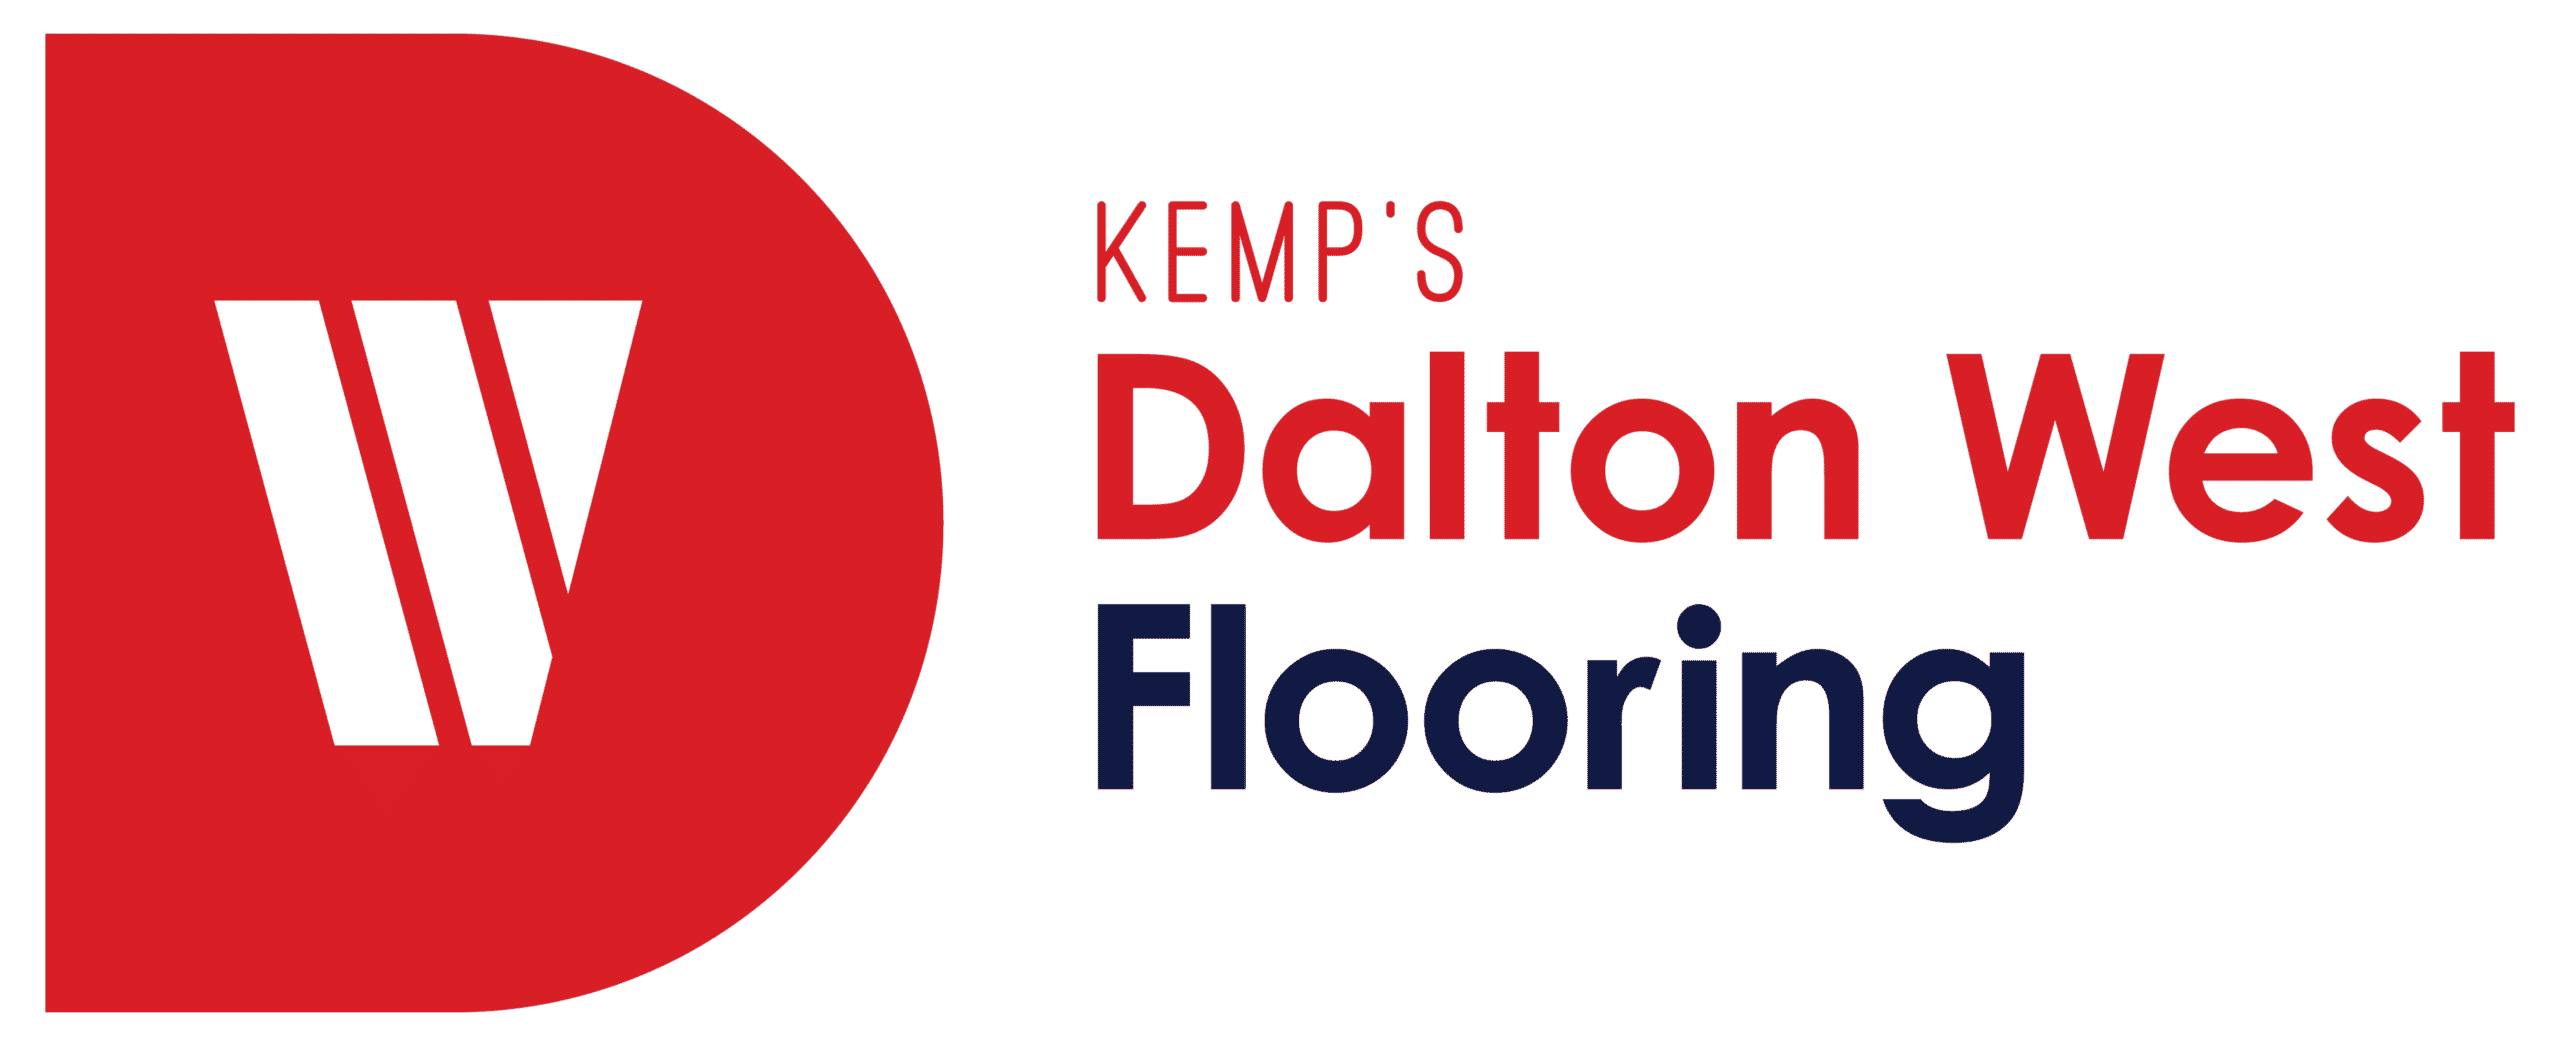 Kemp's Dalton West Flooring